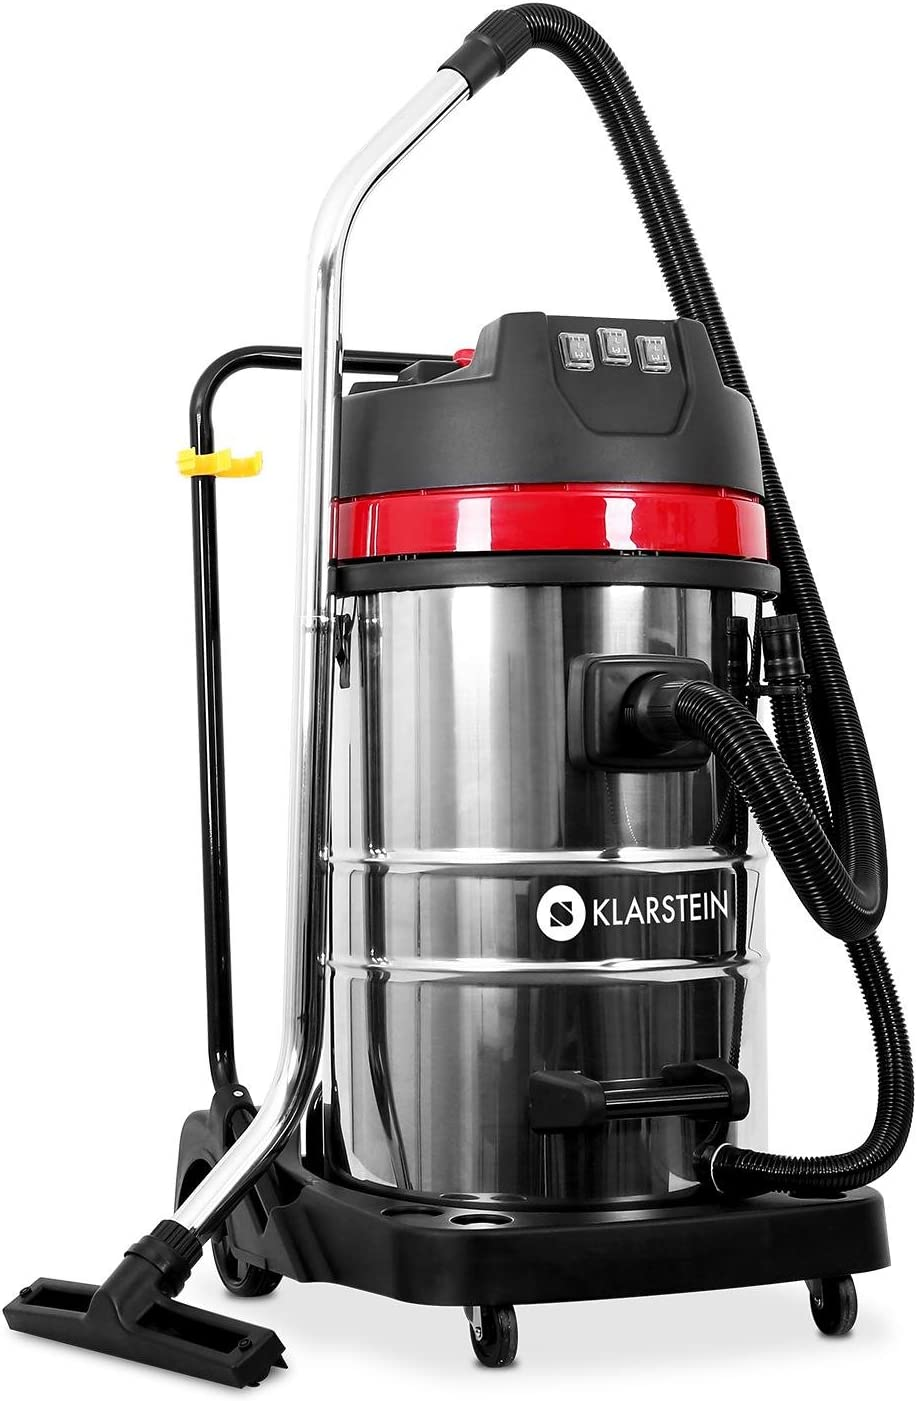 Klarstein IVC-80 - Aspiradora Industrial (80 L, 3000 W, 22,31 kPa, 82 dB, Seca y húmeda, Sin bolsa , Doble motor), Negro metal: Amazon.es: Hogar